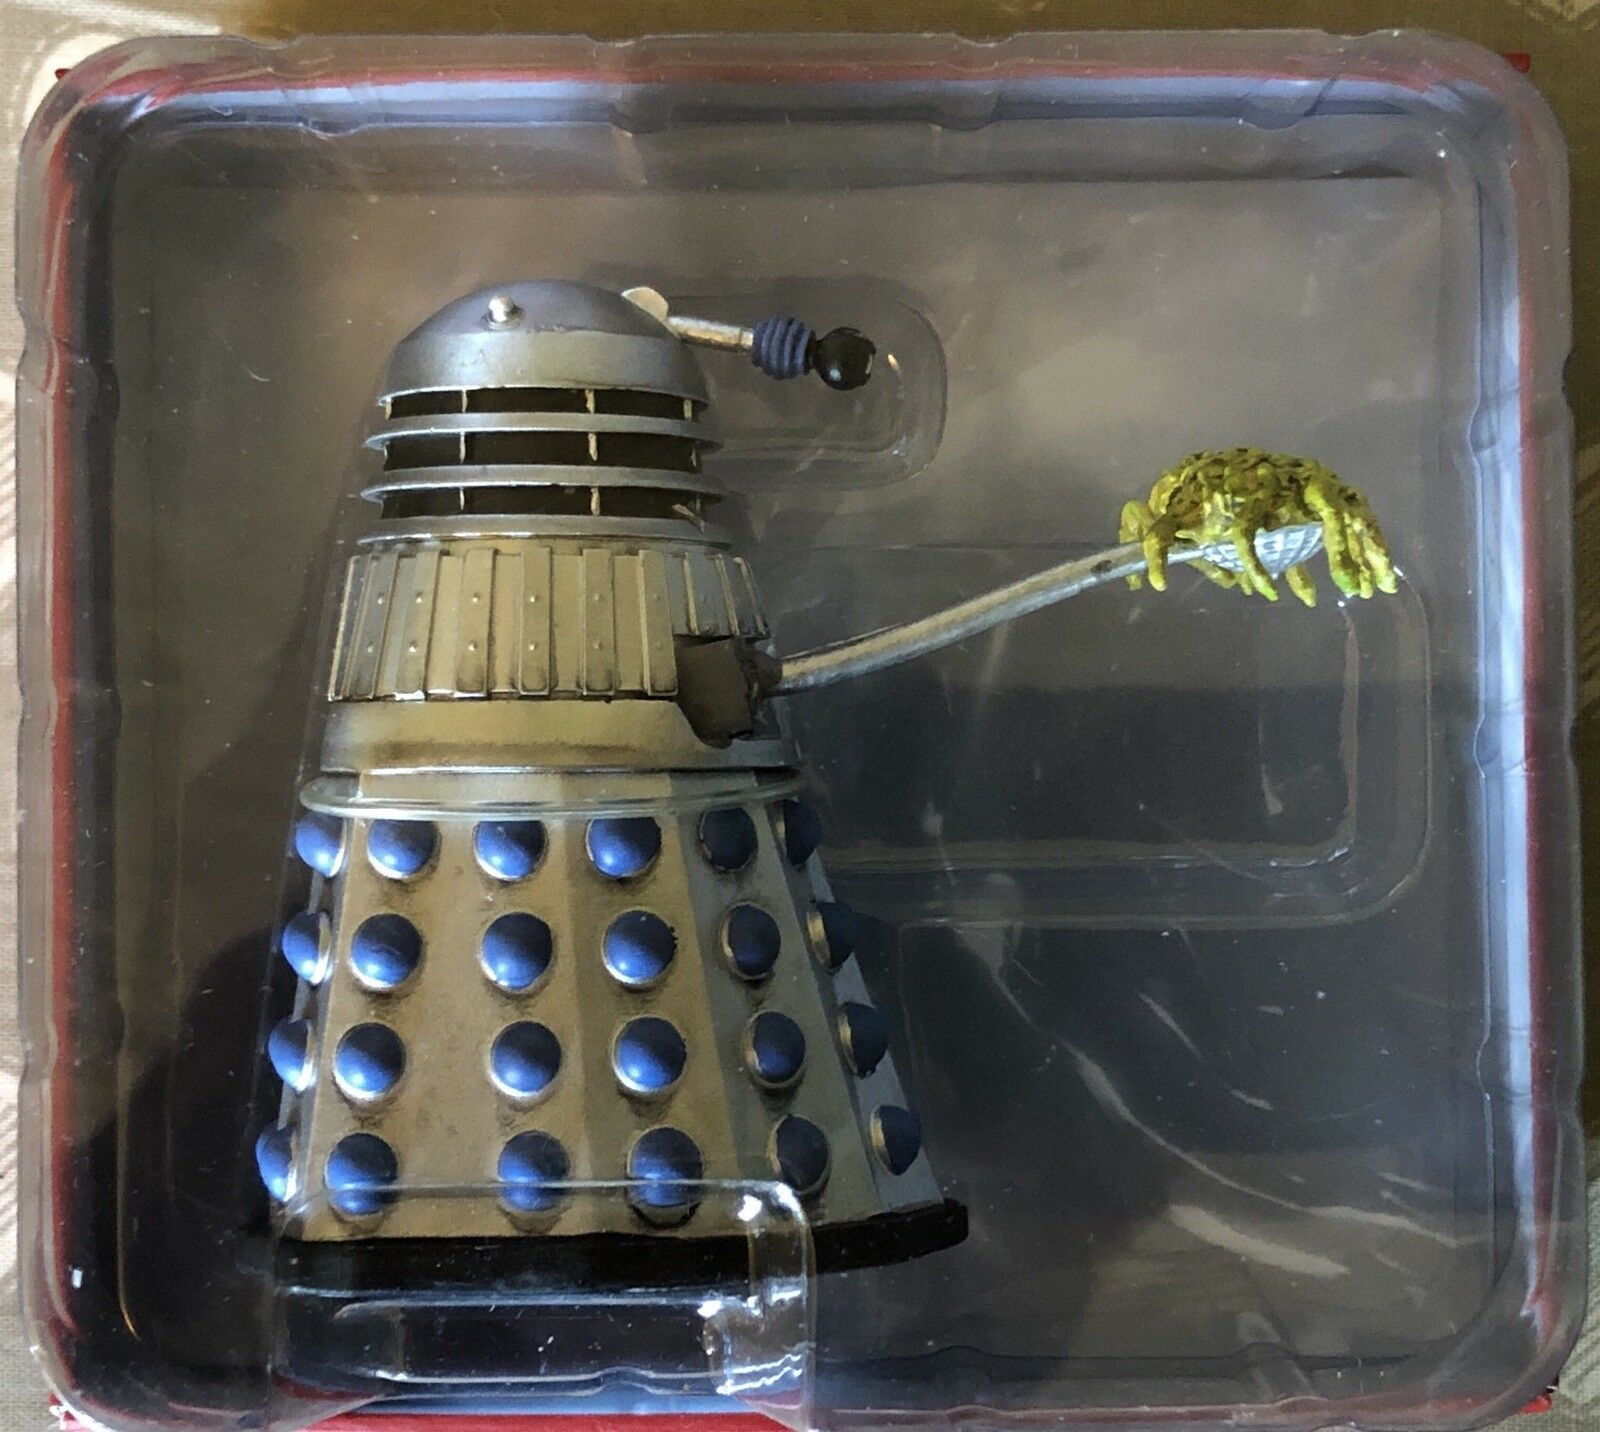 Doctor Who Statuina Rara Dalek 10 Scoop Dalek SD10 abbonato EAGLEMOSS | no mag